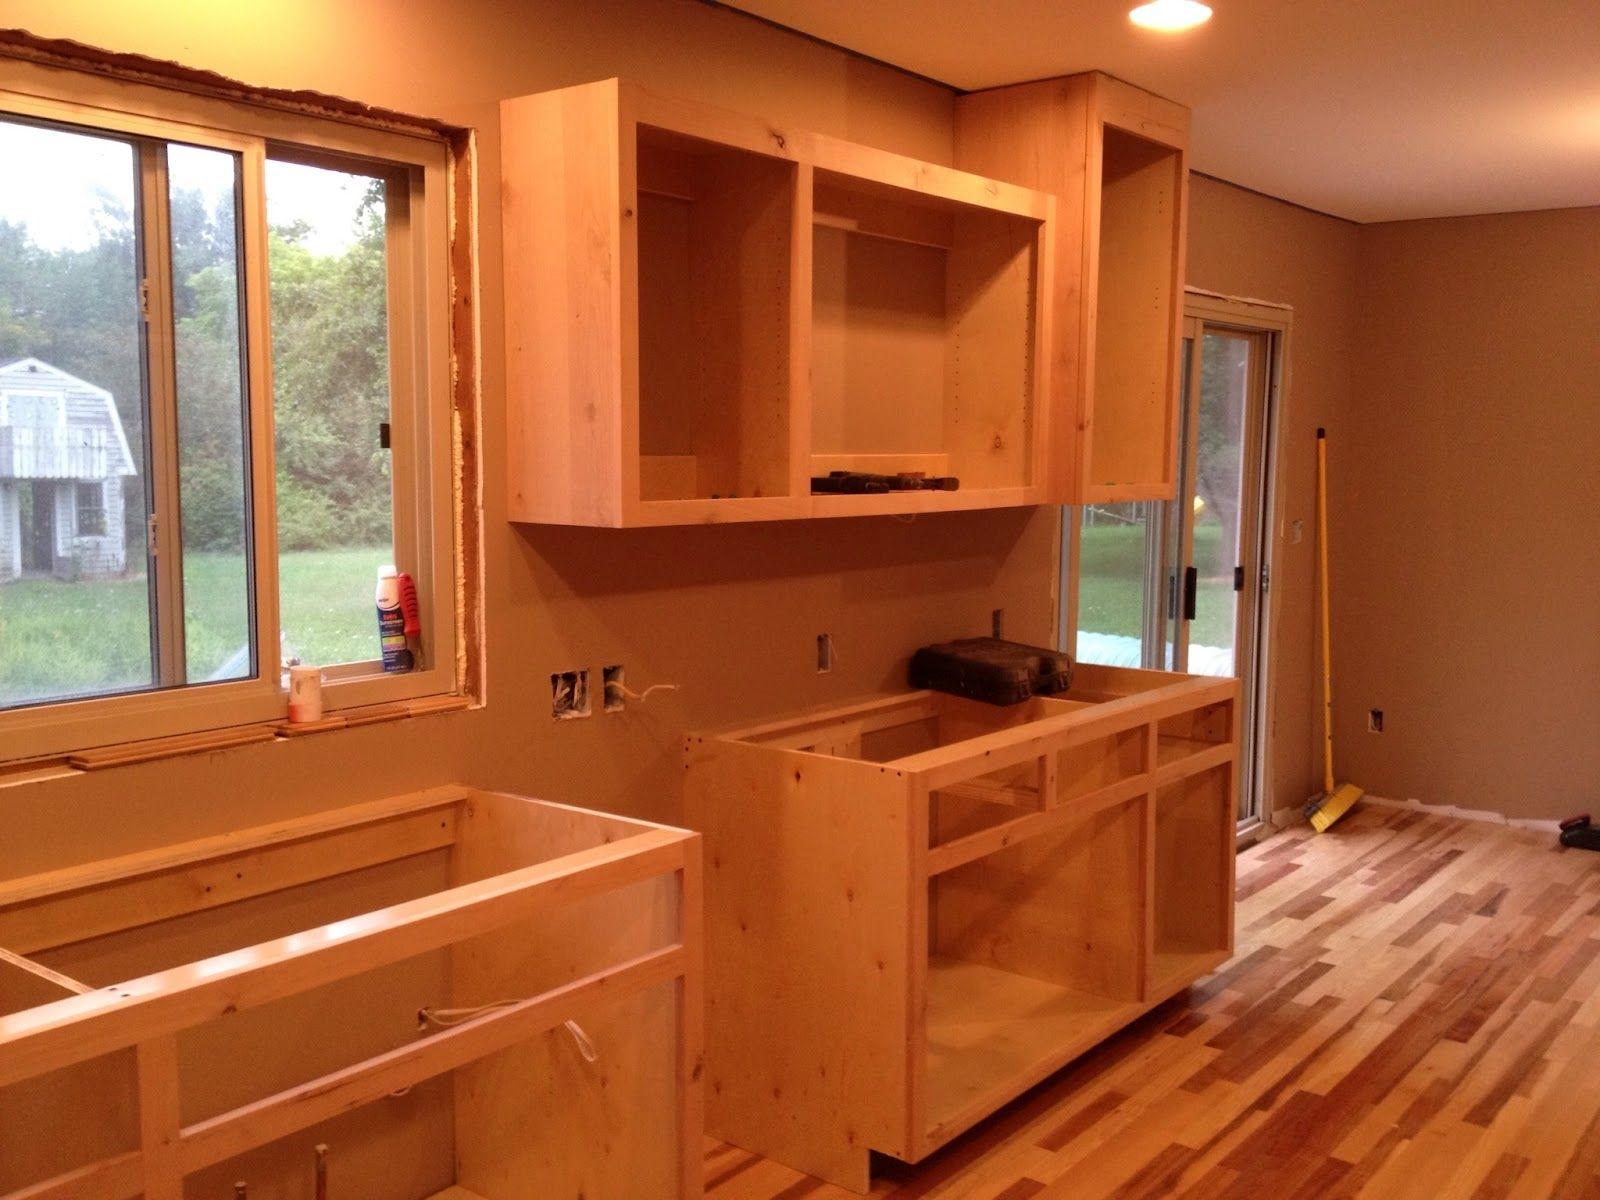 Design Your Own Kitchen Lowes Build Kitchen Google Search Bangface Tv Show House Set